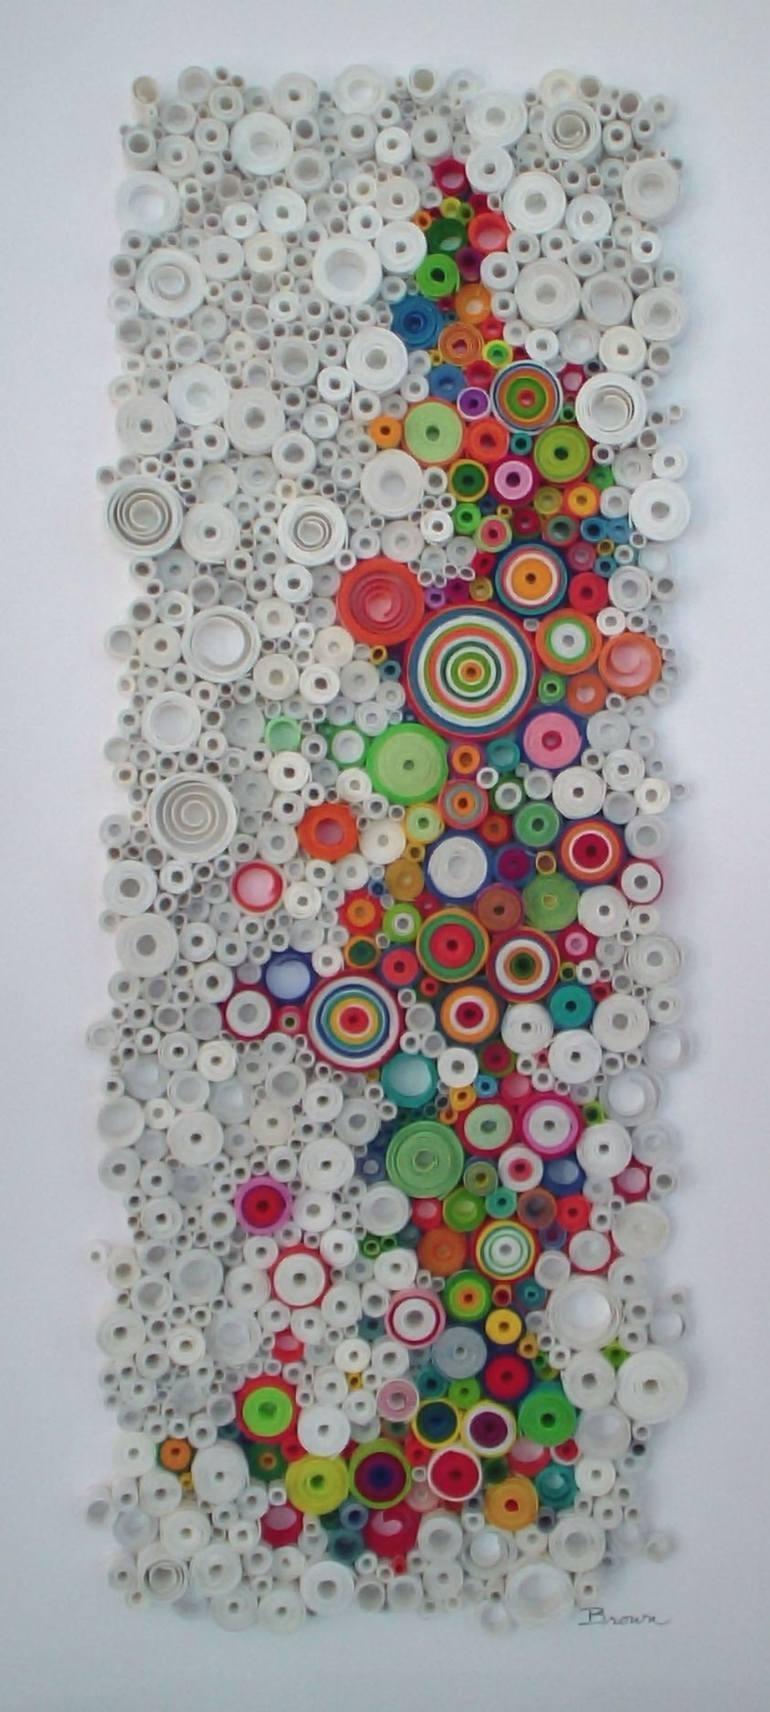 Saatchi Art: Modern Wall Art, Circular Wall Art, Original 3 Pertaining To Newest 3 Dimensional Wall Art (Gallery 3 of 20)